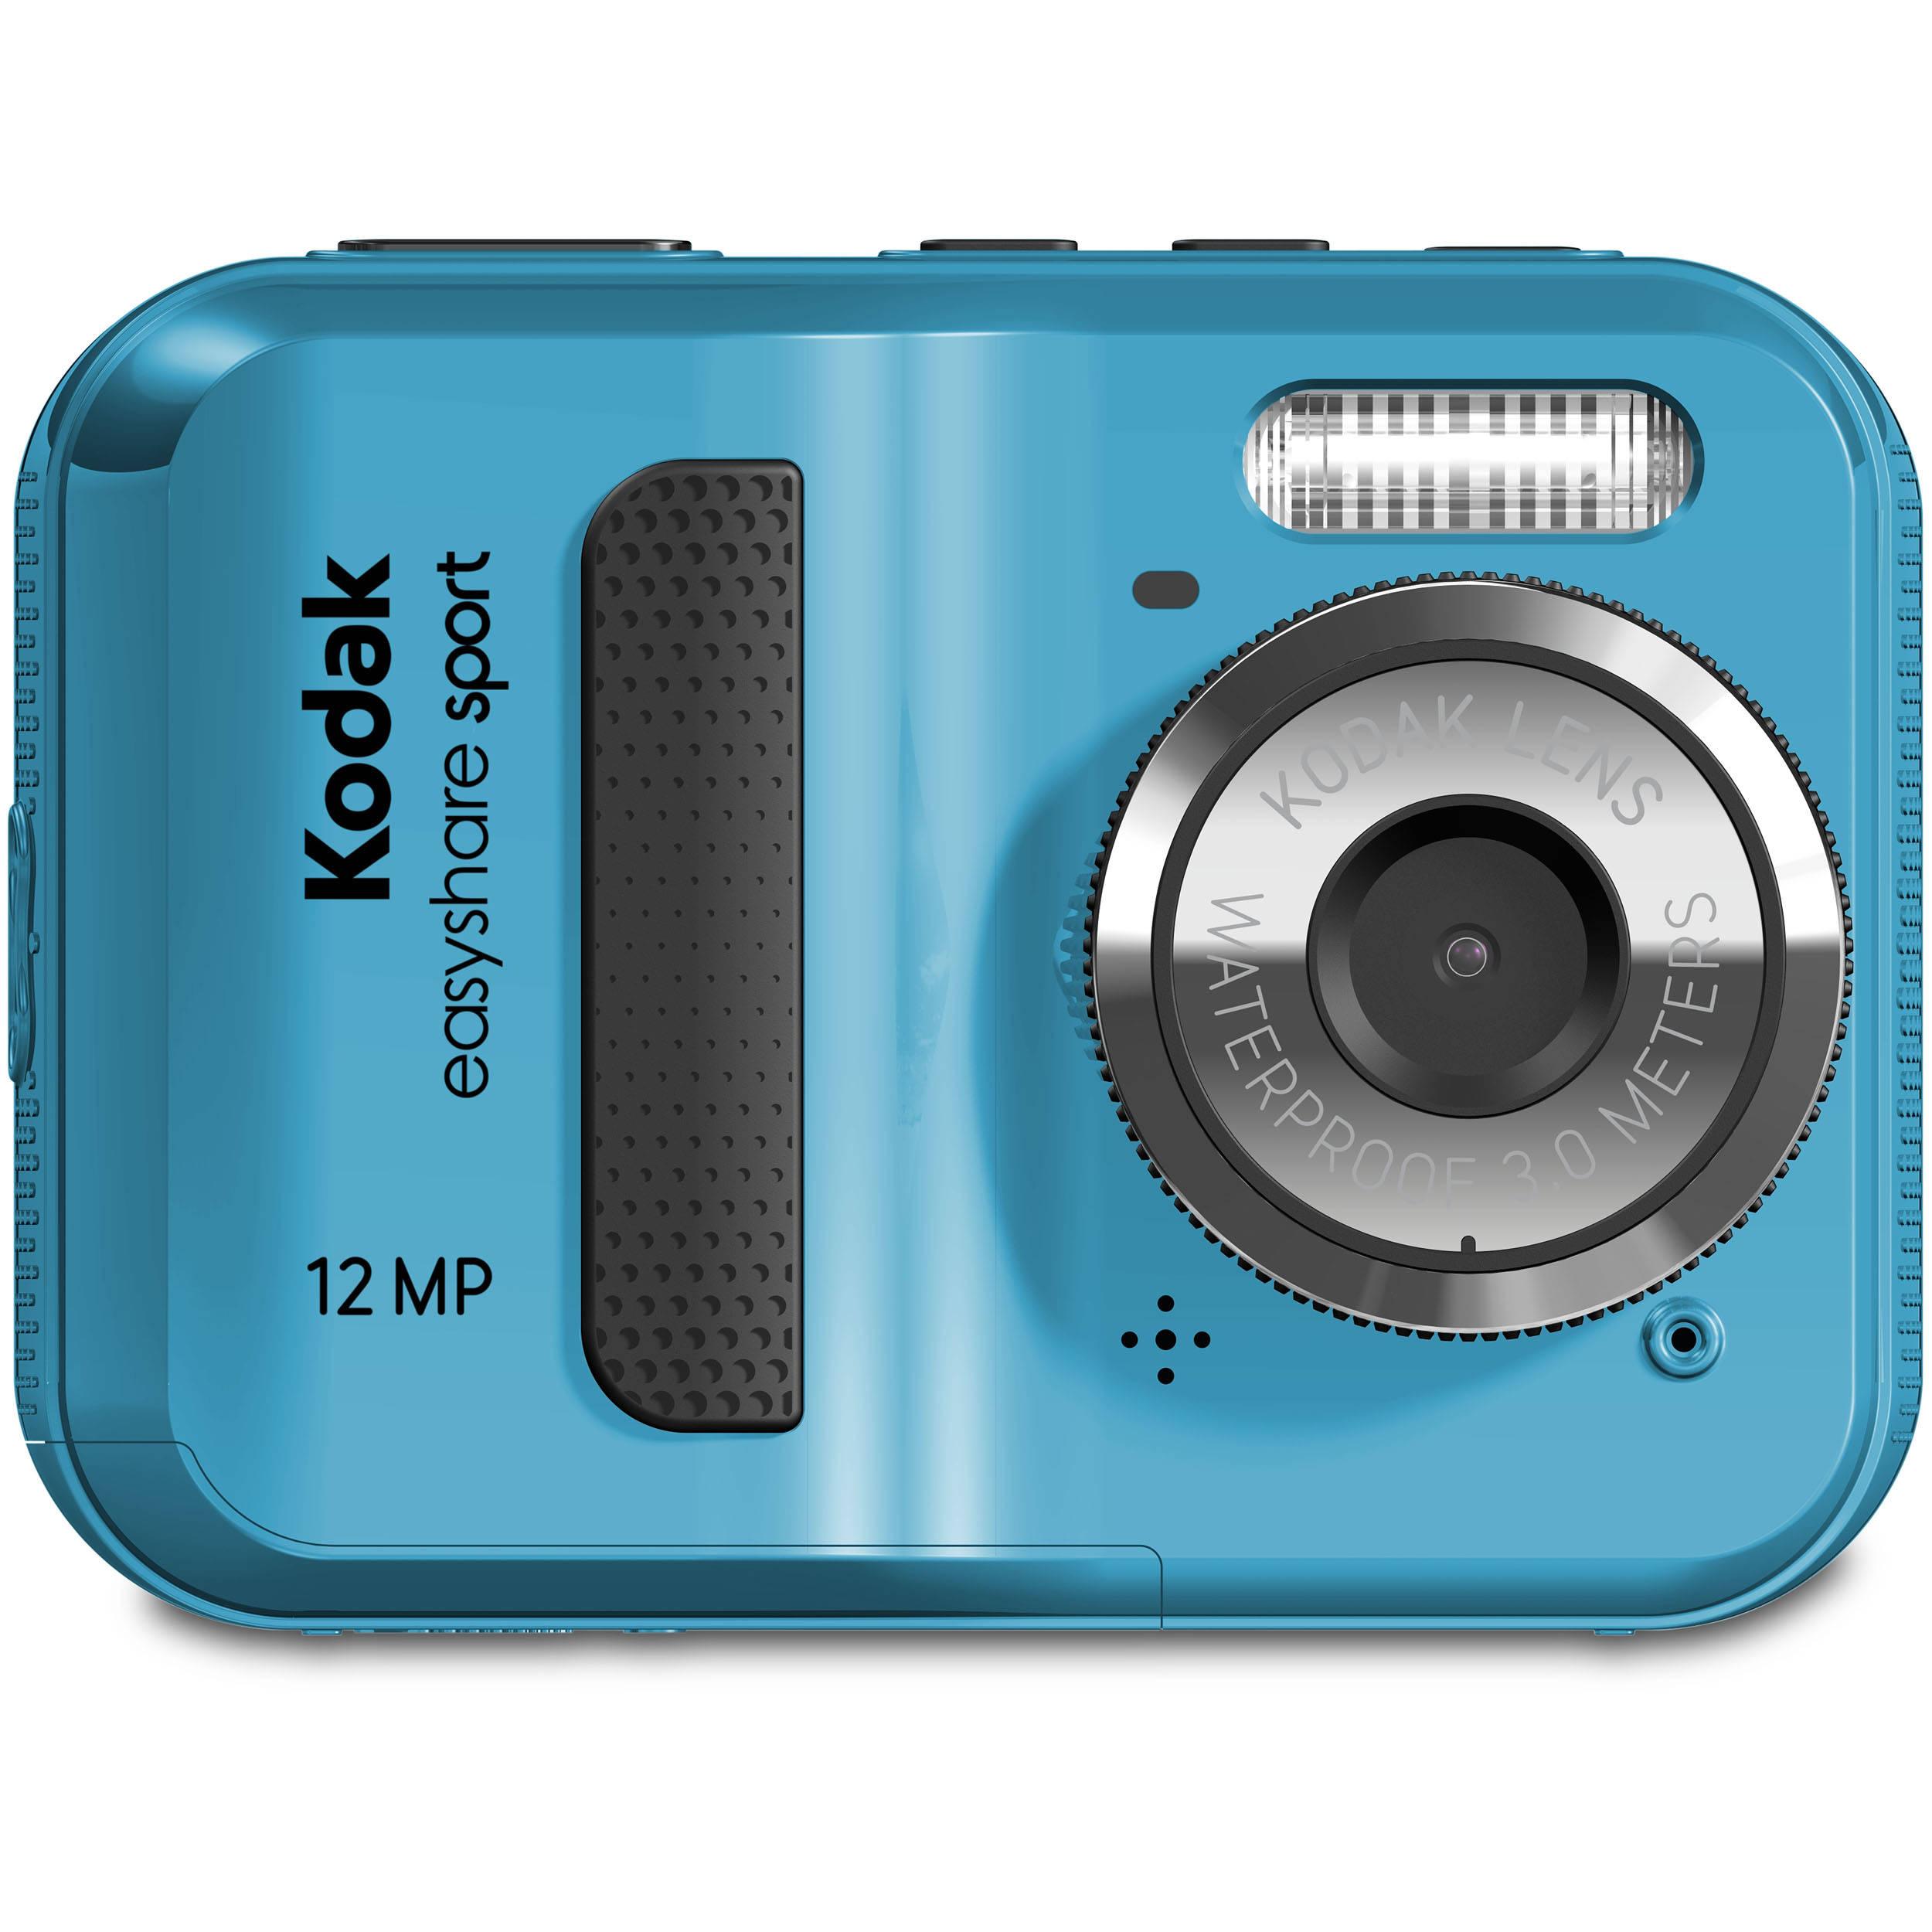 kodak easyshare sport c123 digital camera blue 1564194 b h rh bhphotovideo com Kodak EasyShare Sport Software Kodak EasyShare Camera